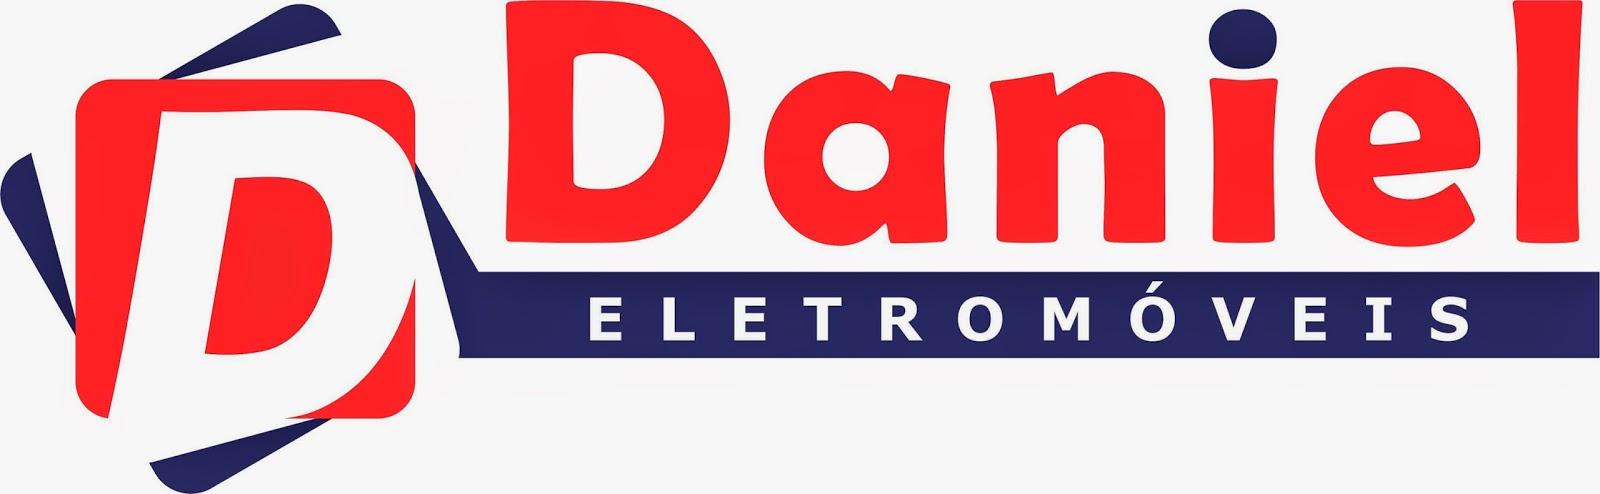 DANIEL ELETROMÓVEIS